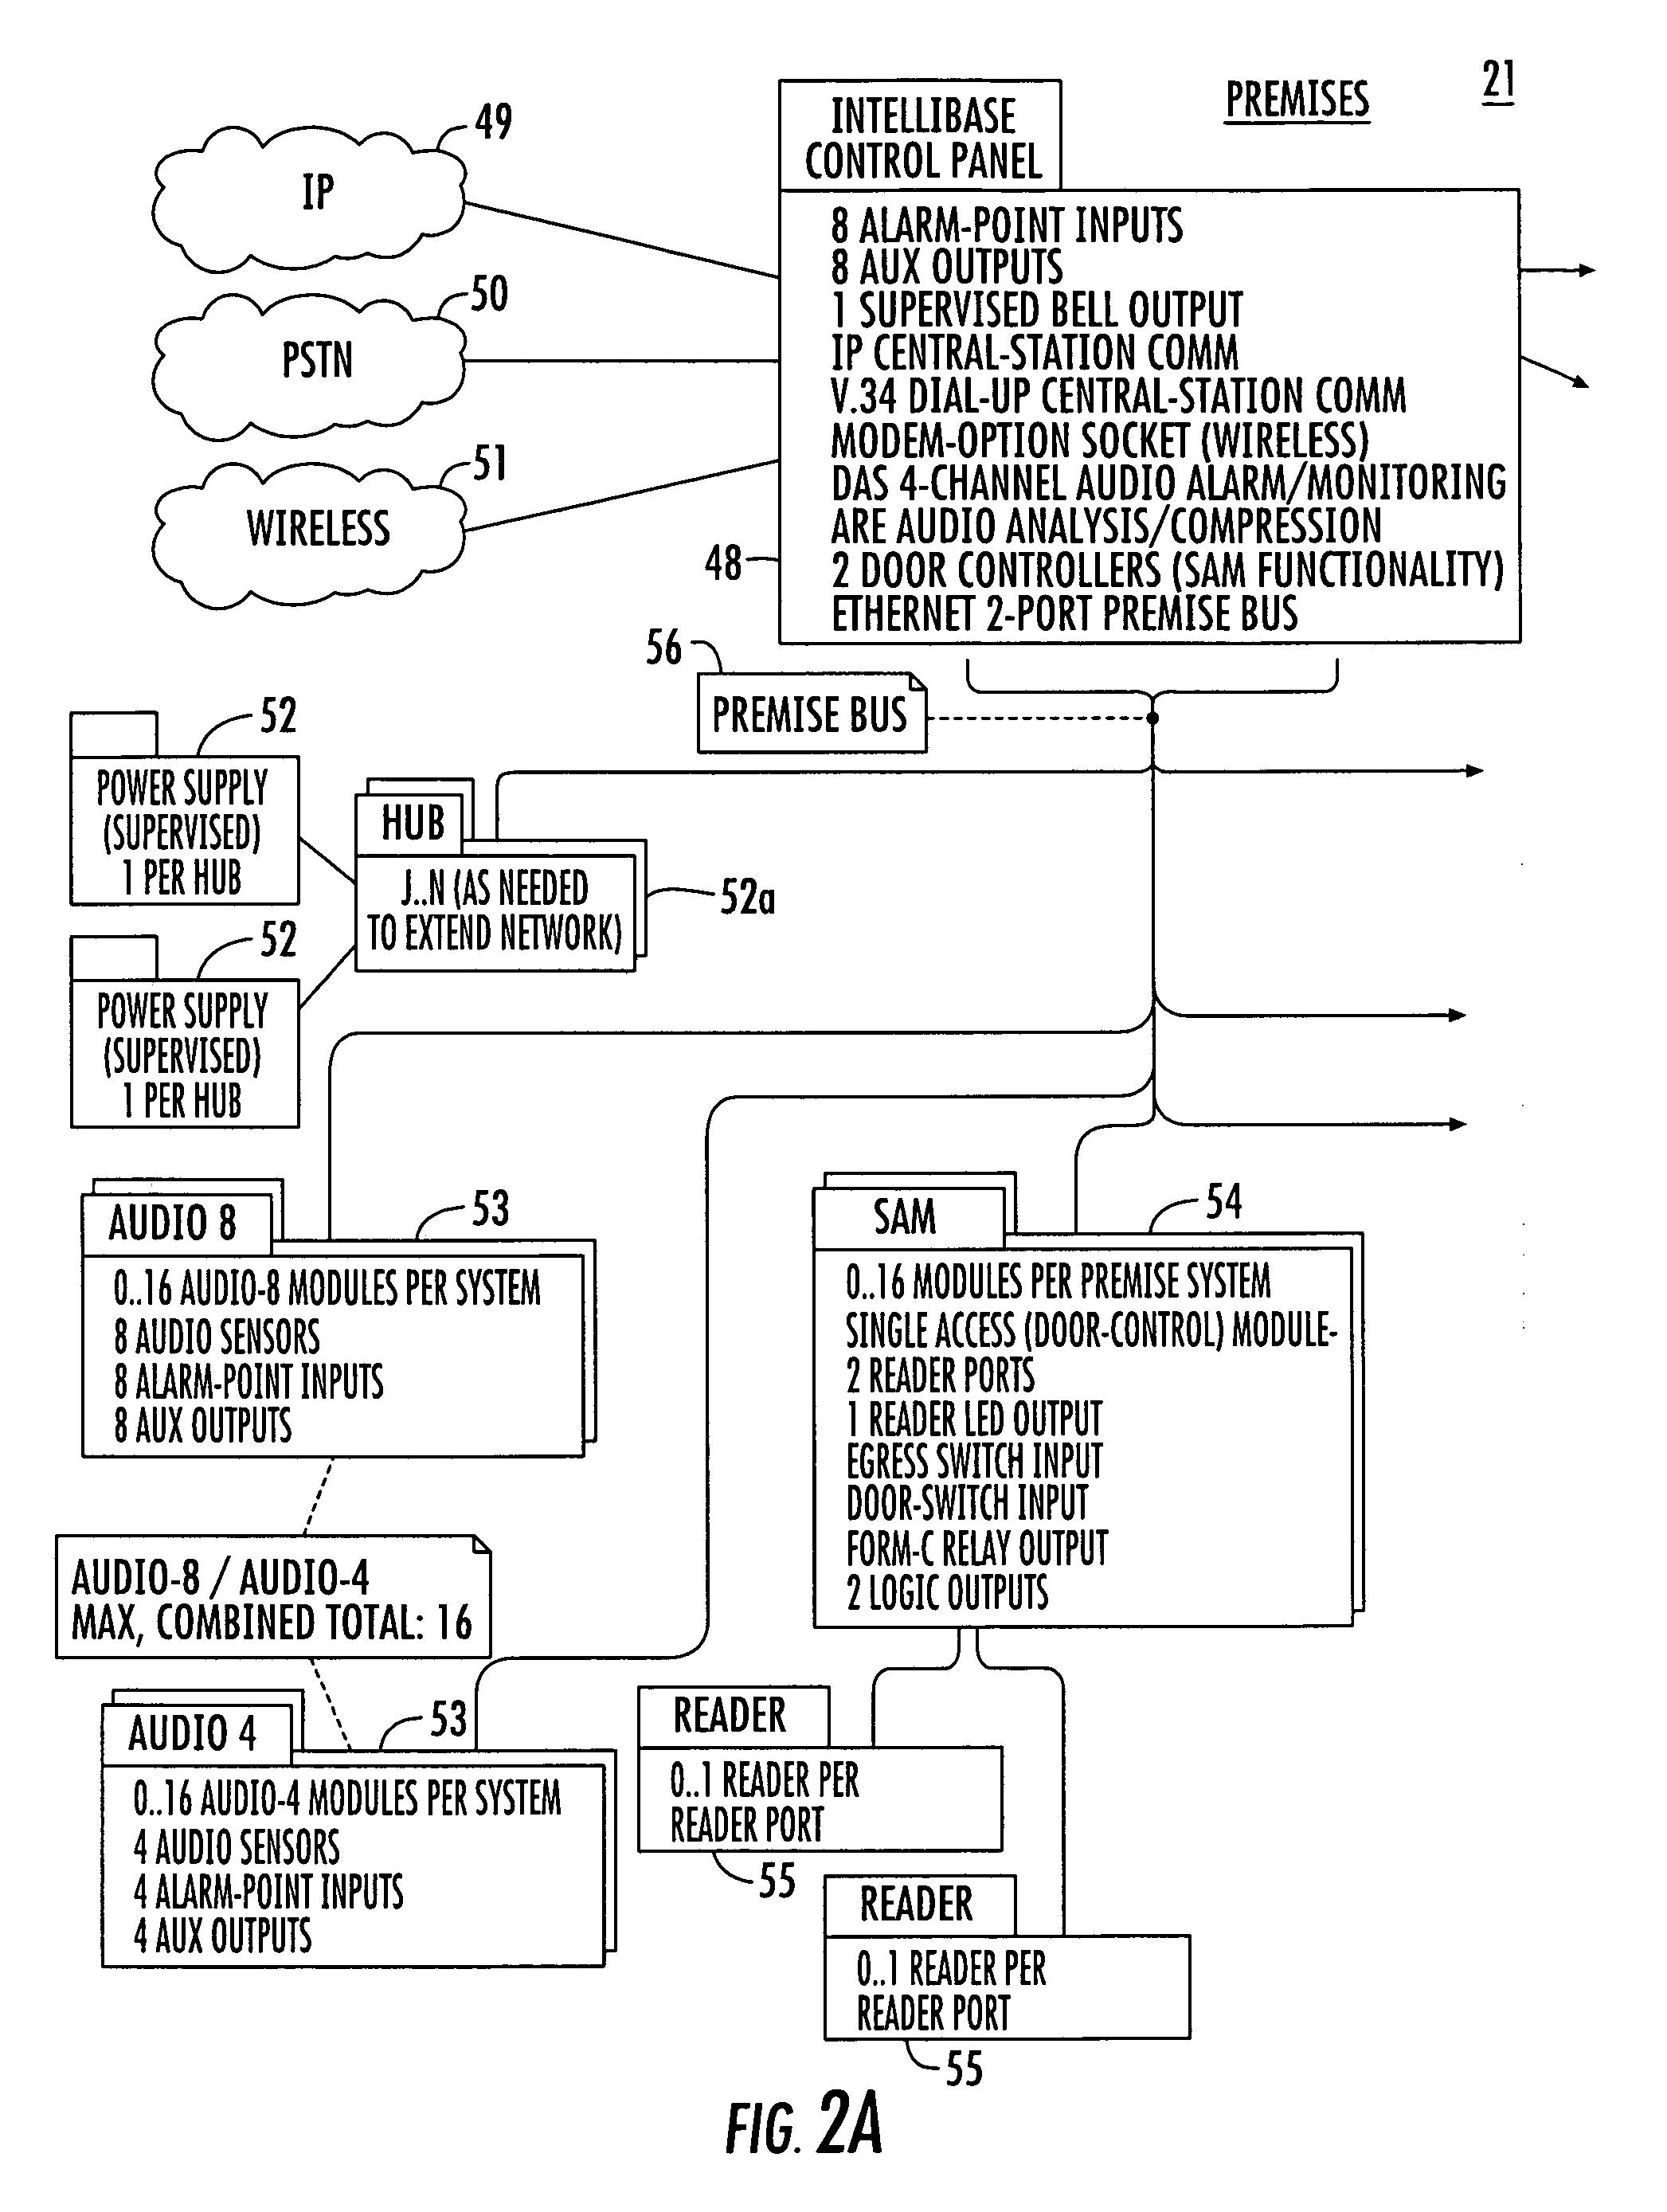 Sonitrol Wiring Diagram : 23 Wiring Diagram Images